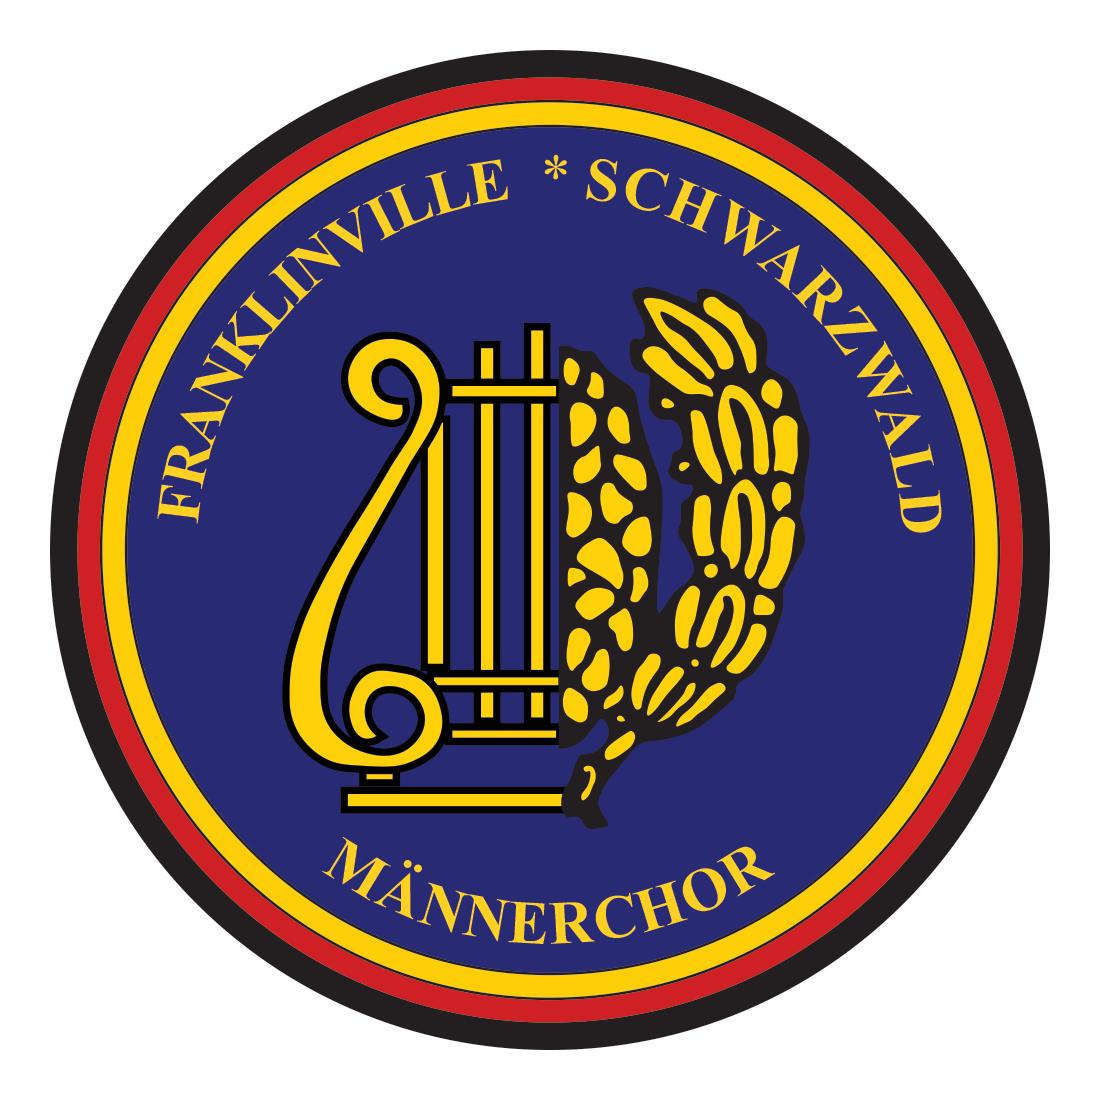 Franklinville-Schwarzwald Männerchor